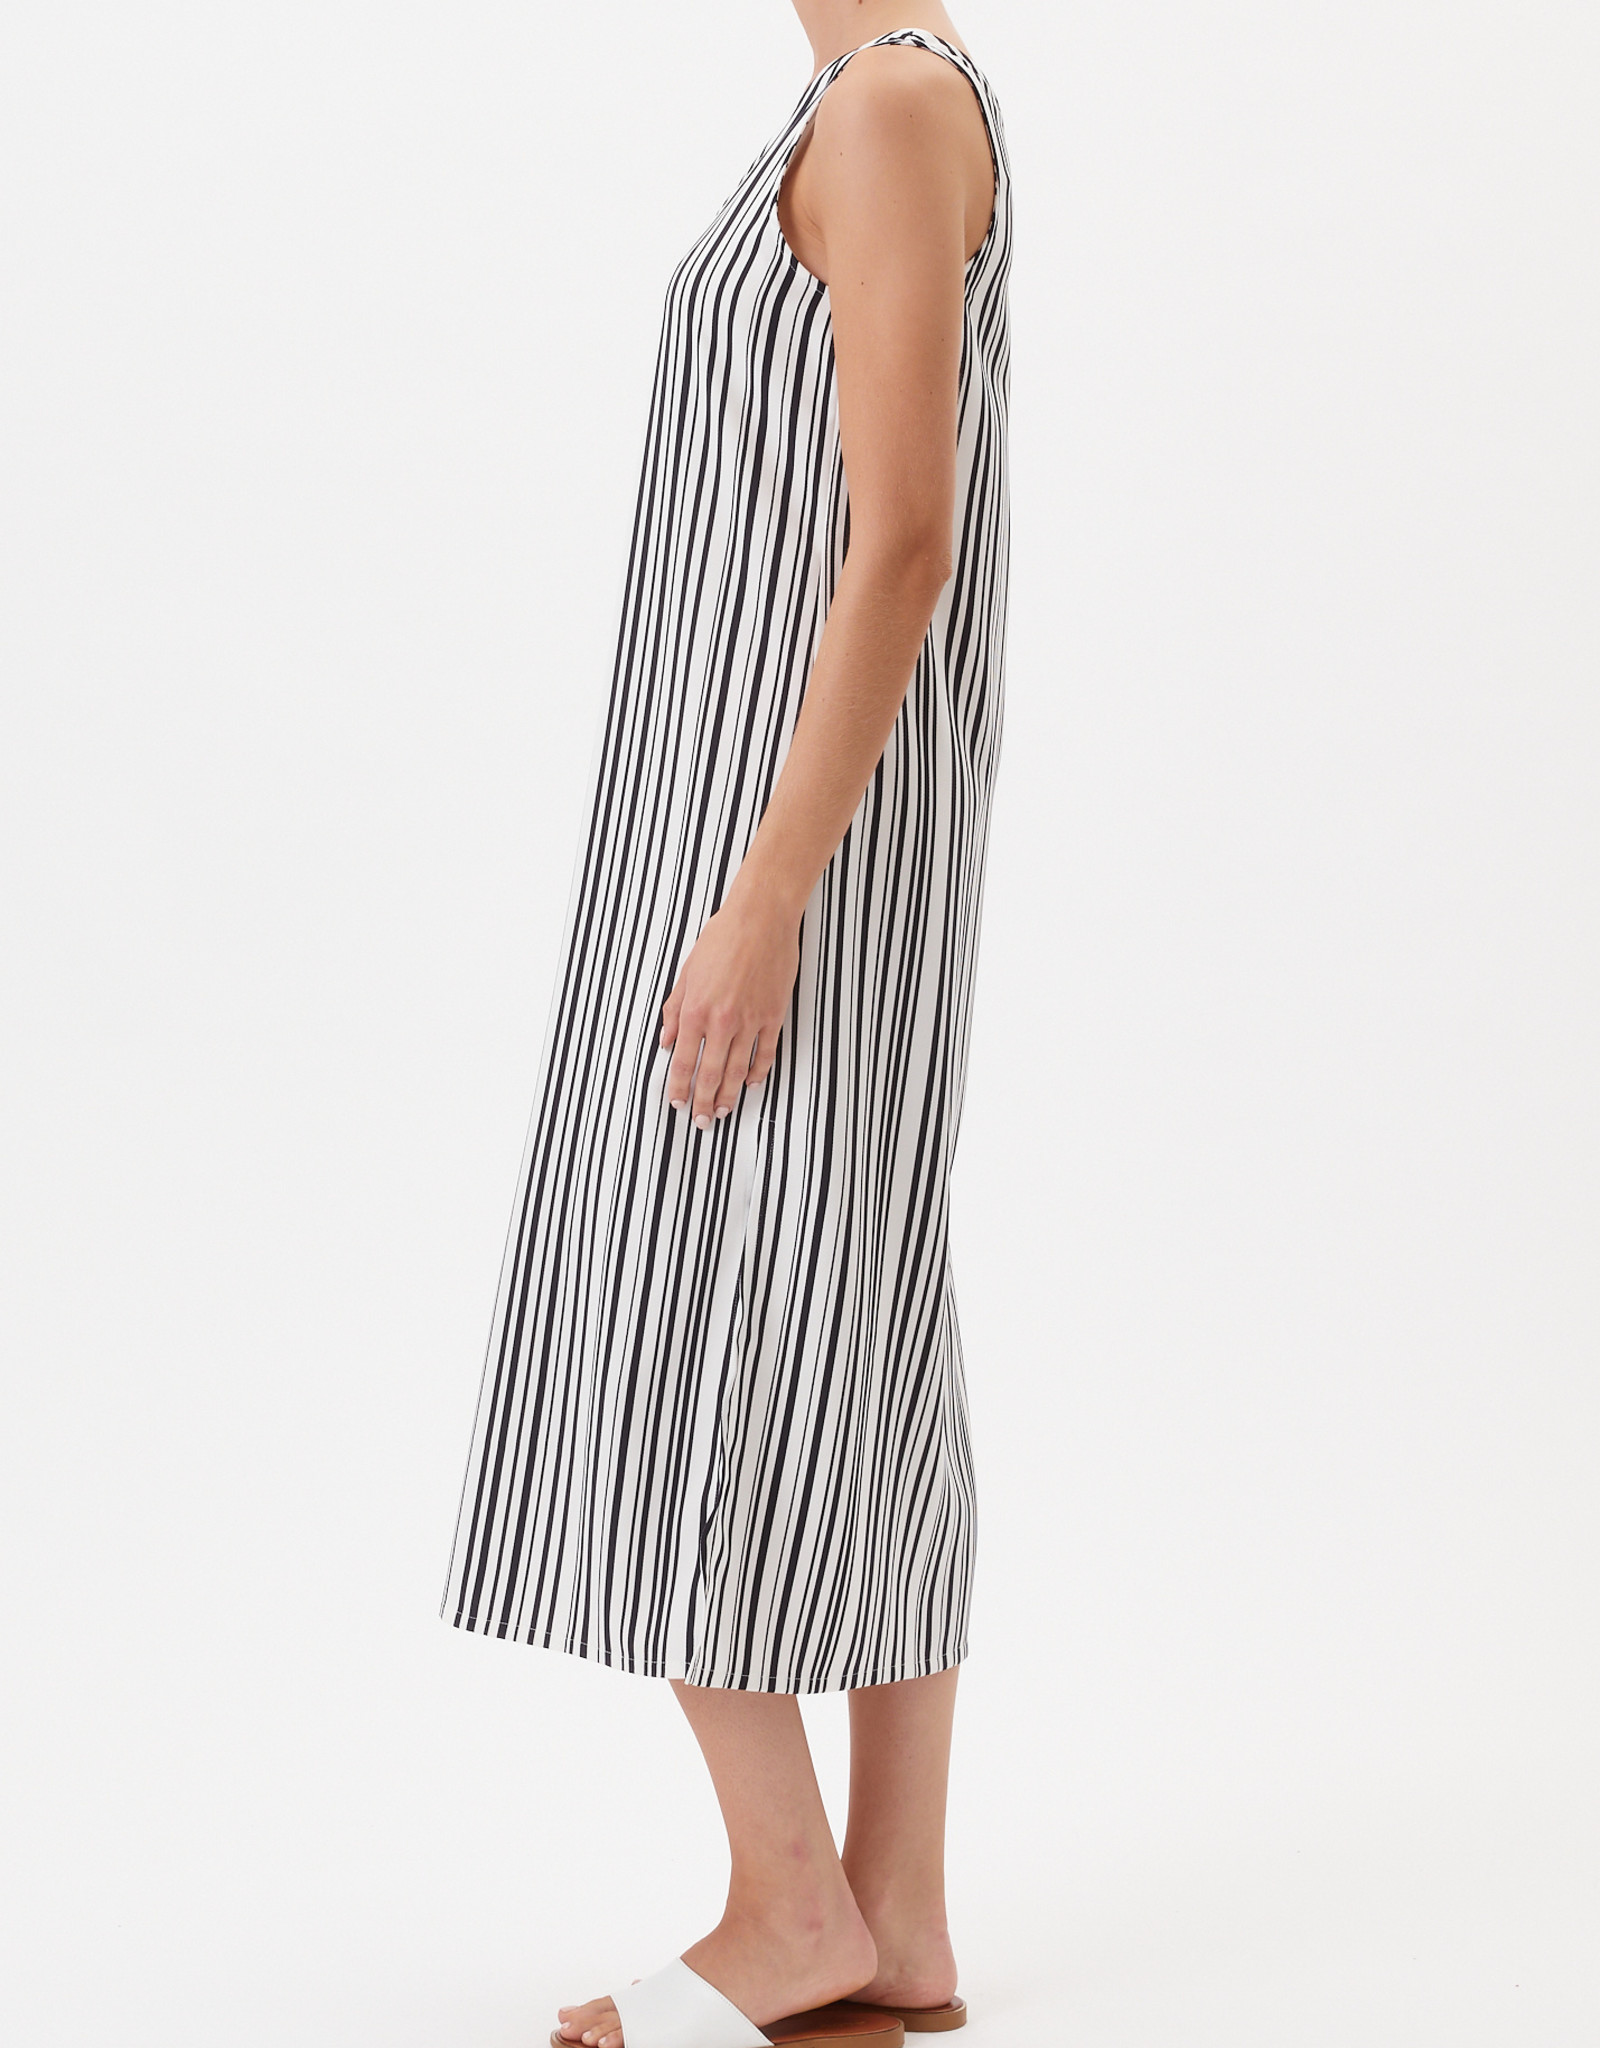 I Love Tyler Madison Sally Monaco Dress